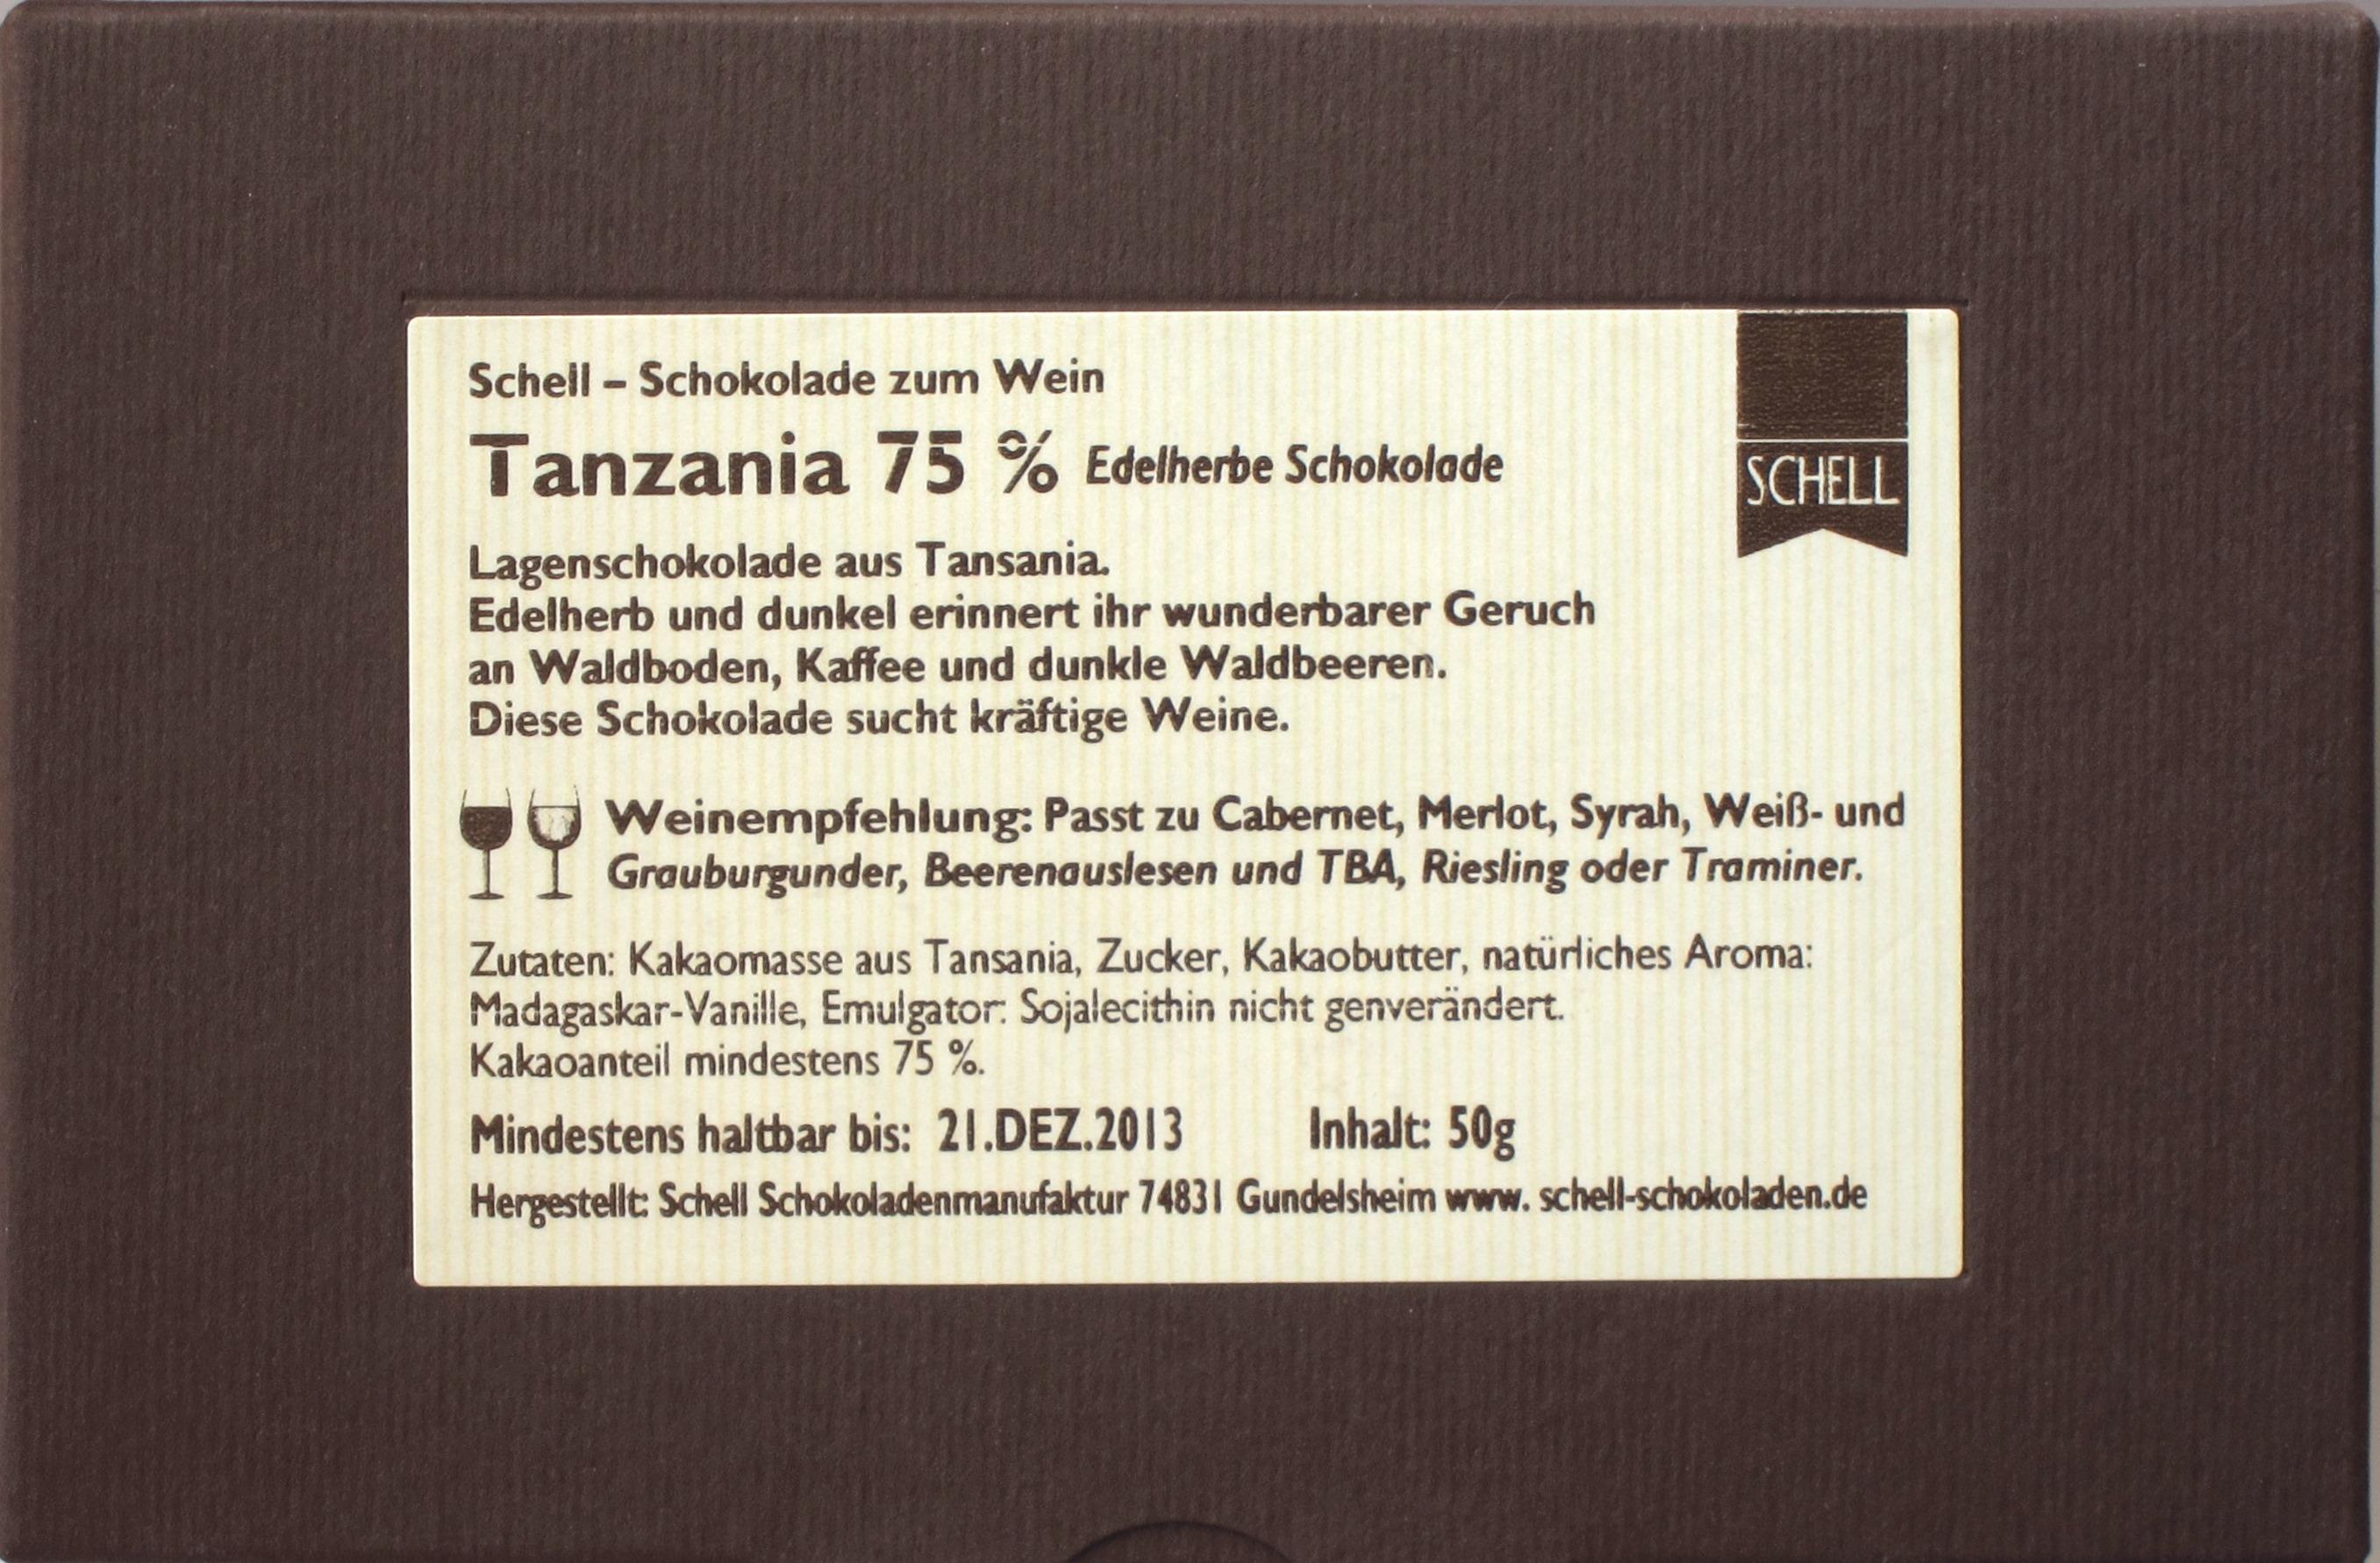 Schell-Schokolade Tanzania - Rückseite